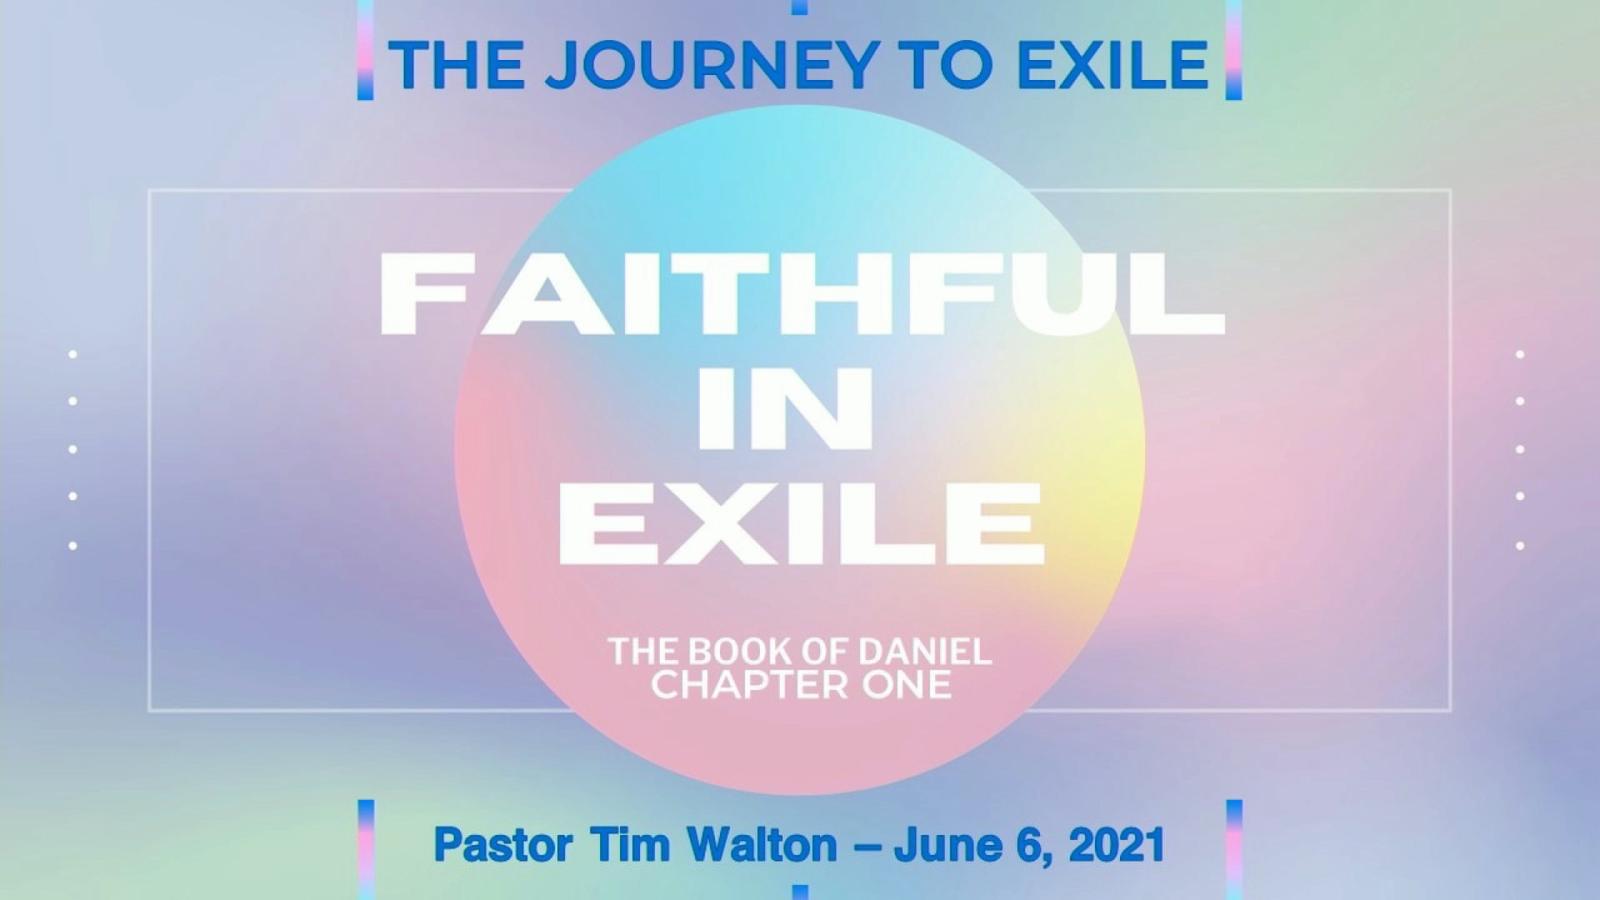 Faithful in Exile